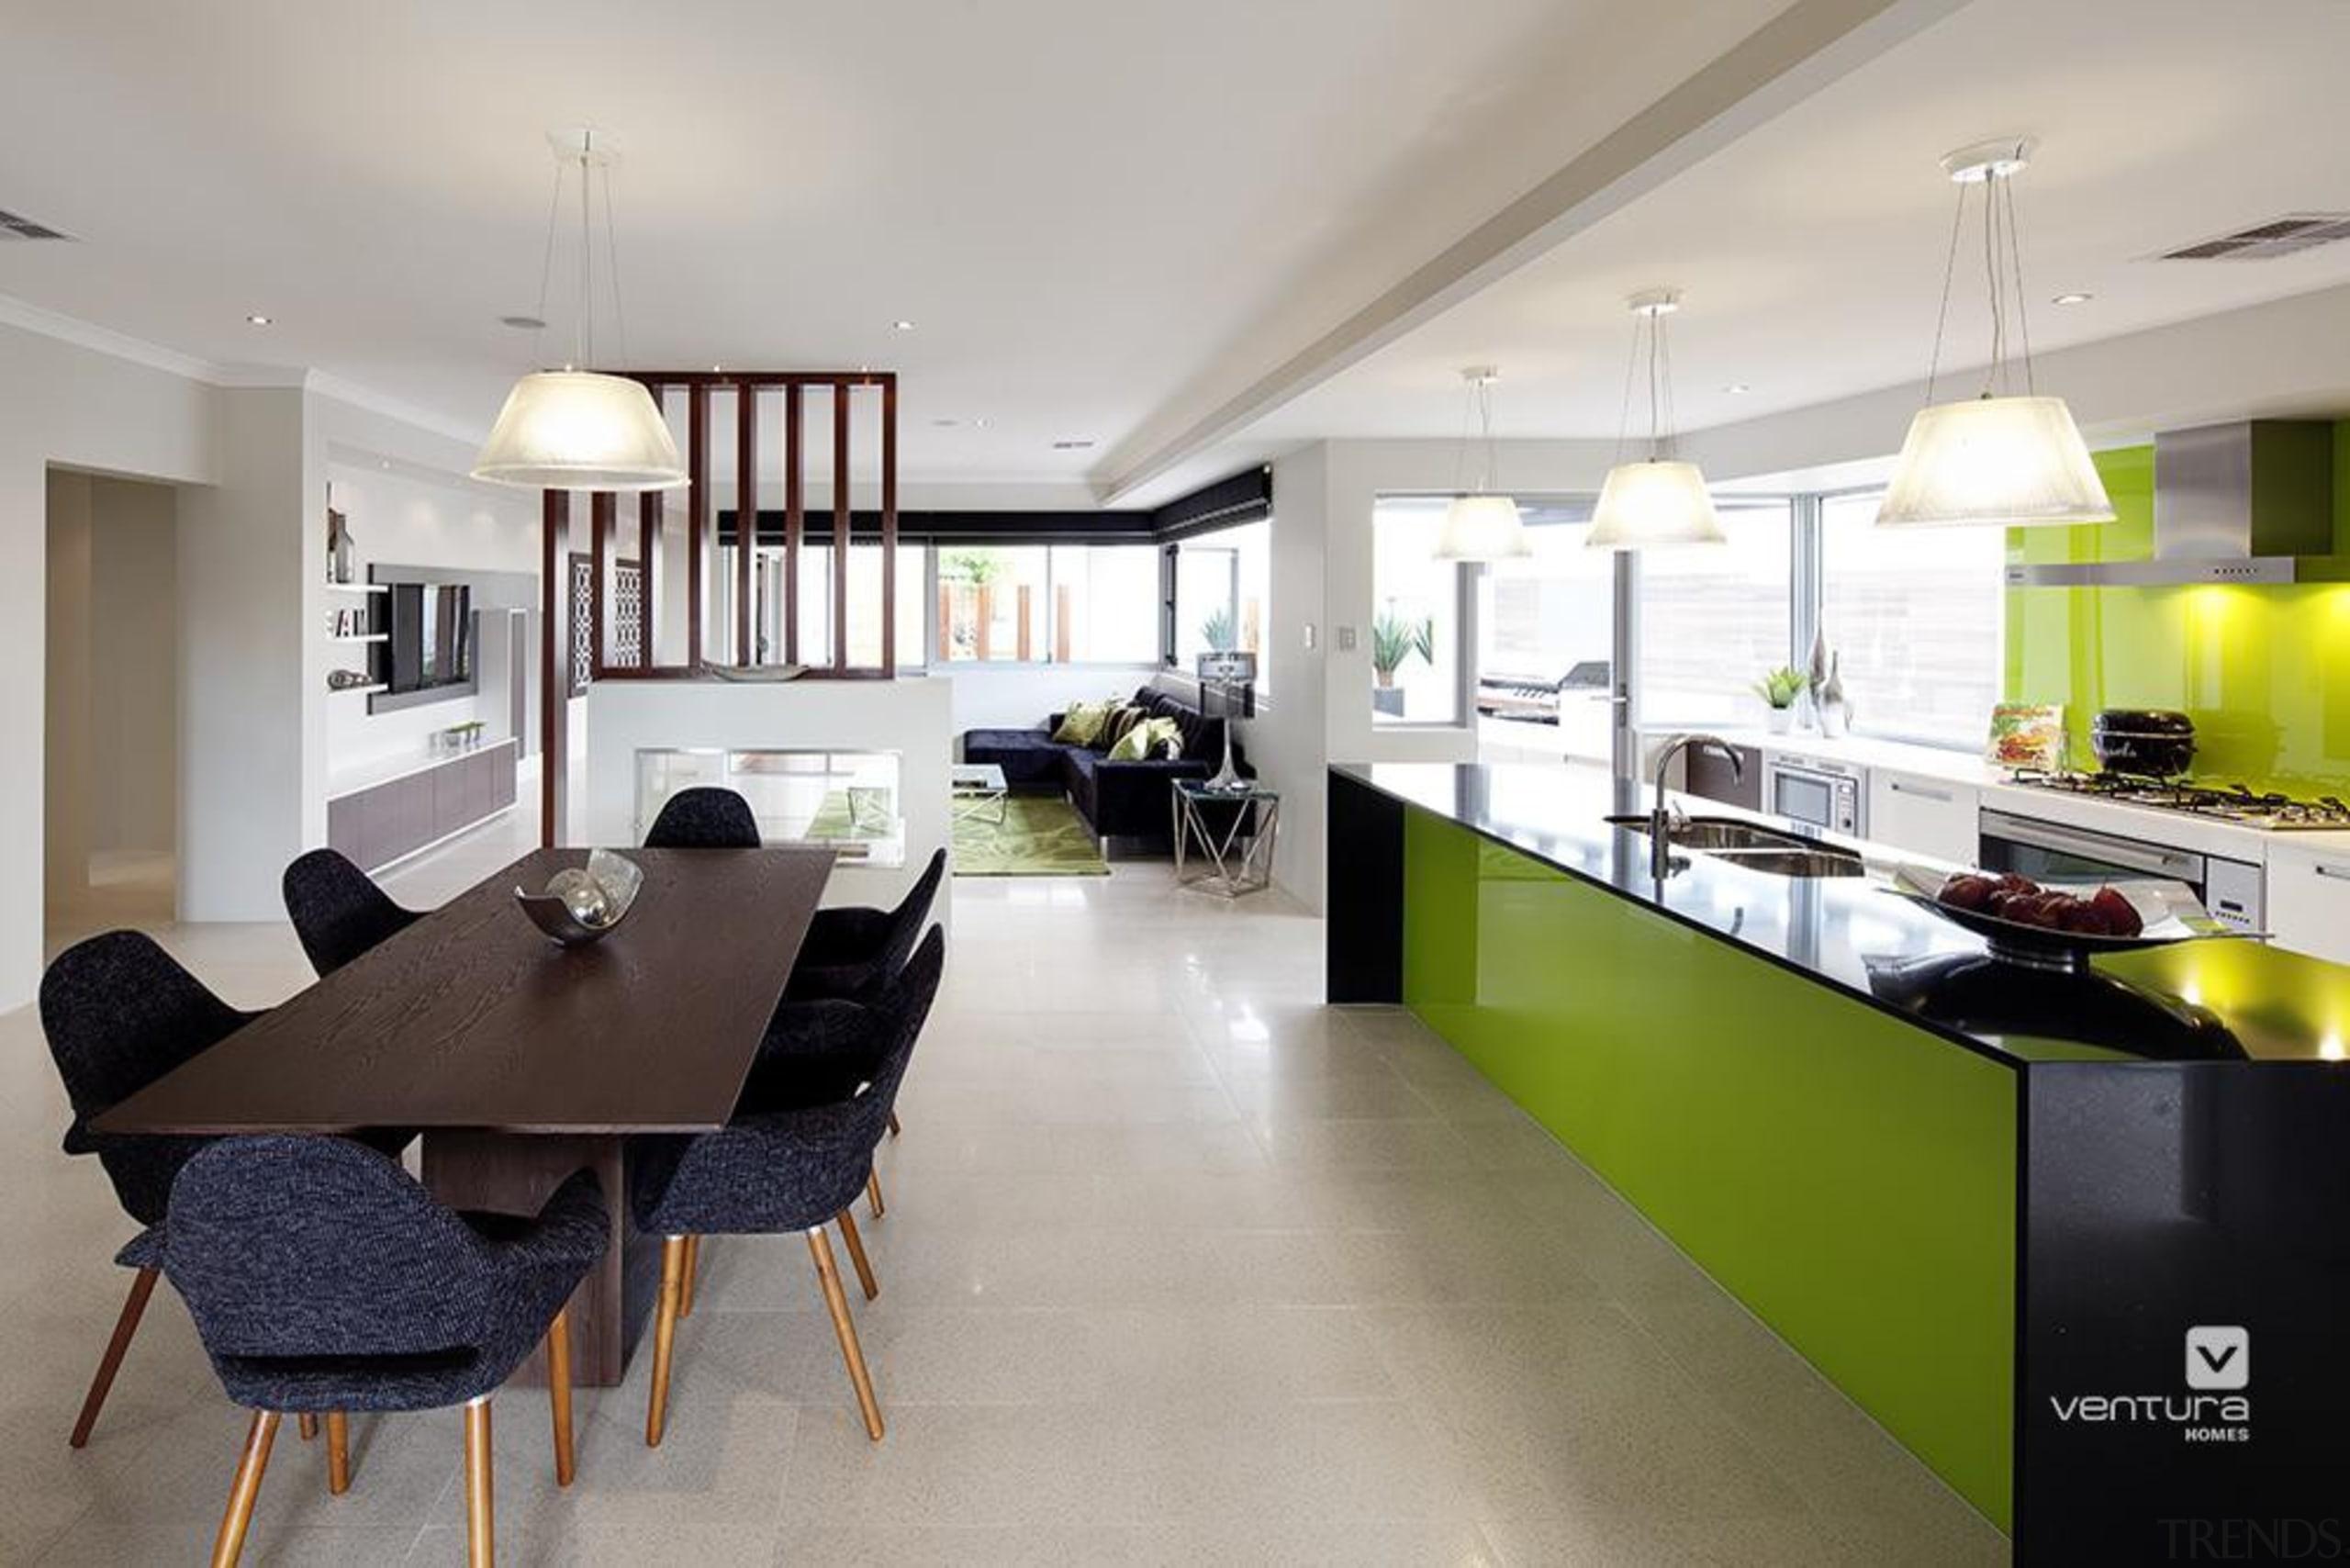 Kitchen design. - The Spectrum Display Home - apartment, house, interior design, kitchen, real estate, gray